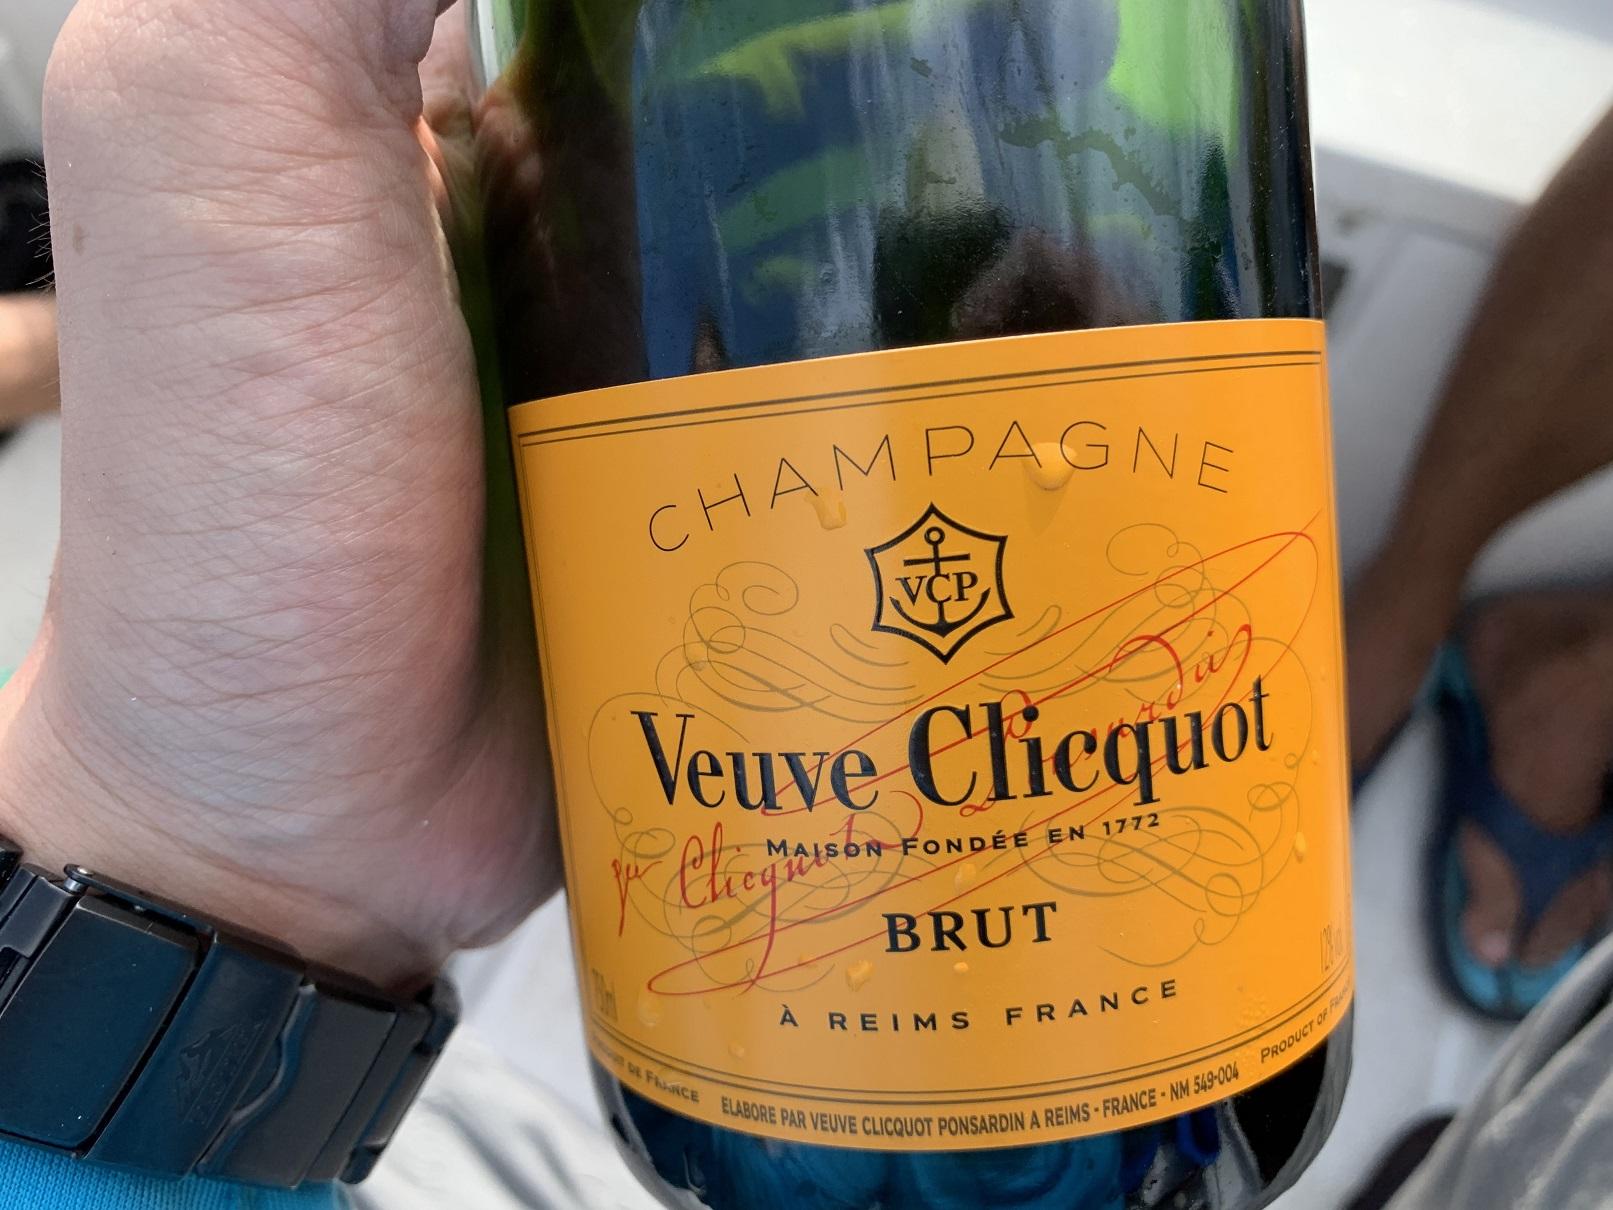 Manda recommended Veuve Champagne!